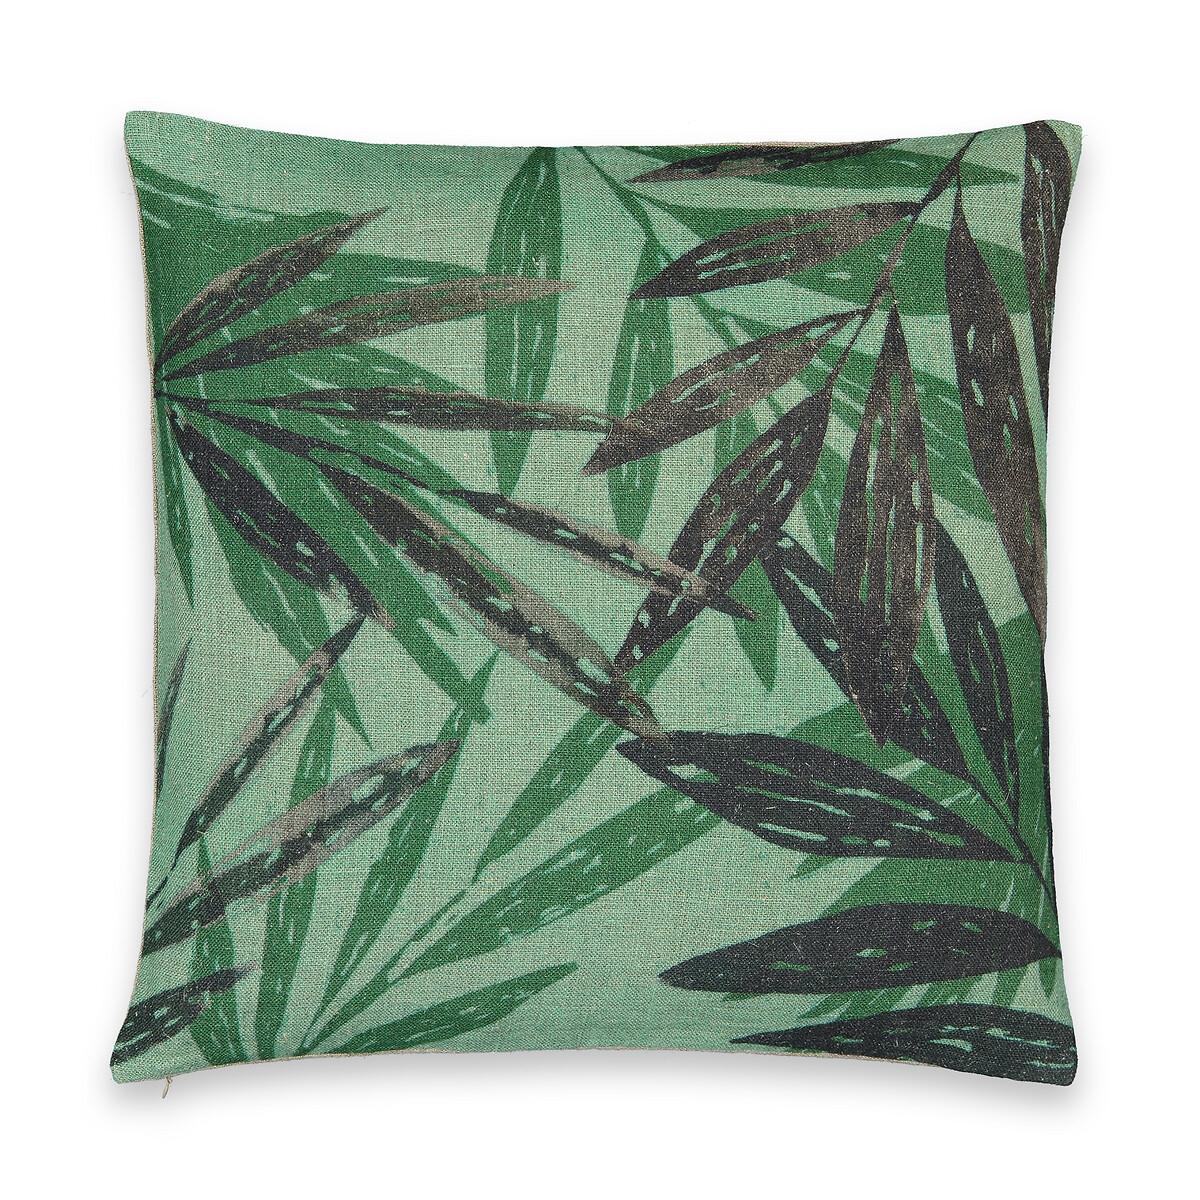 Чехол LaRedoute На подушку из льна Anagi 50 x 50 см зеленый